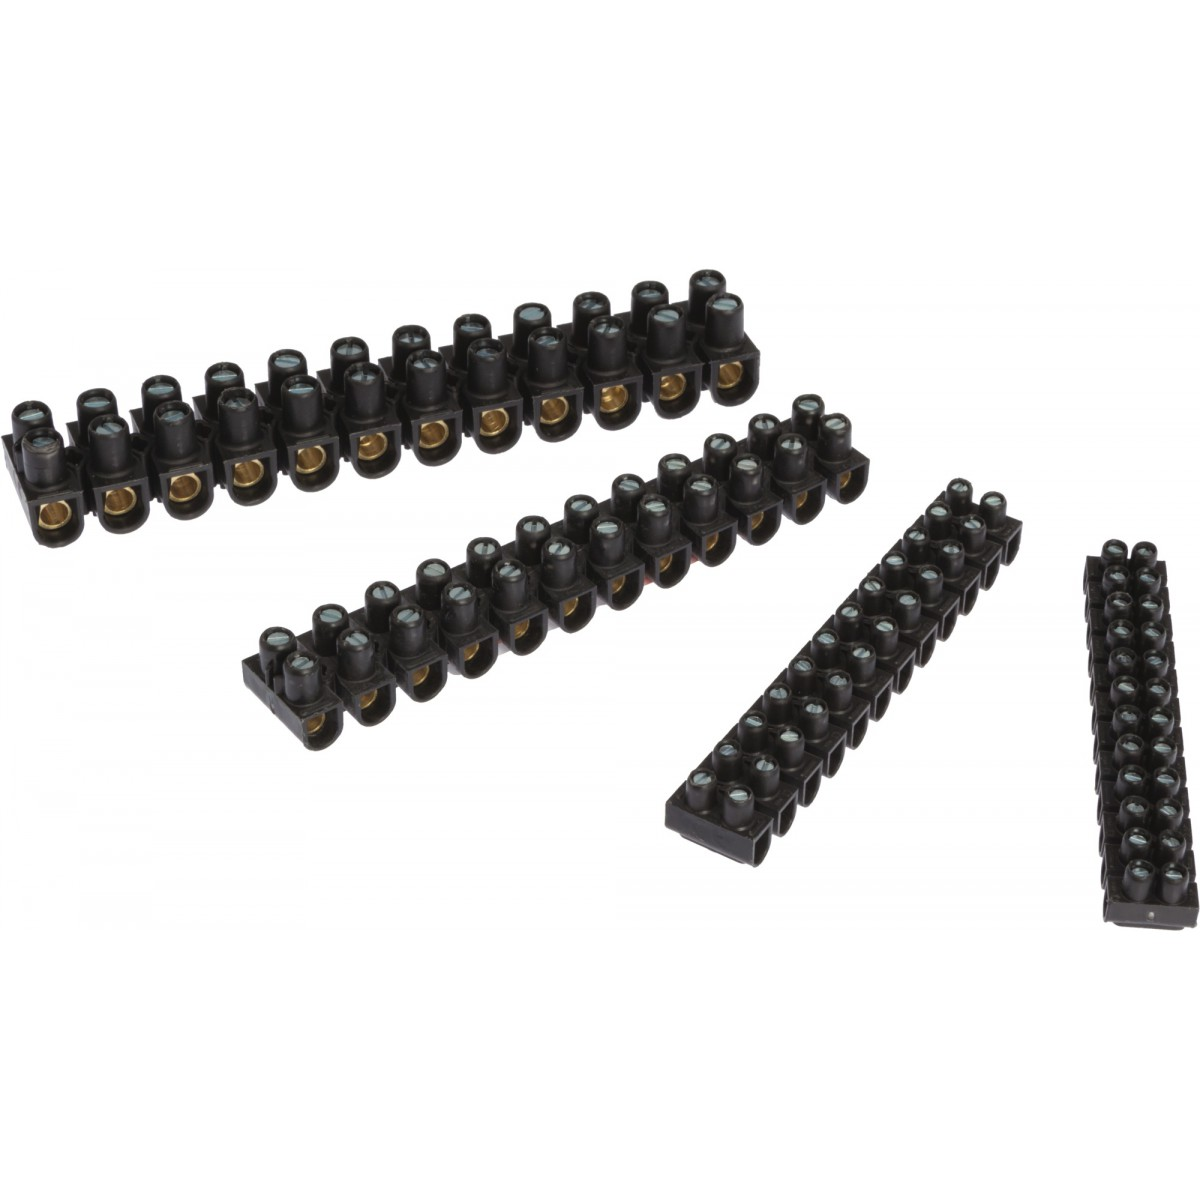 Barette 2 x 12 Nylbloc noire Legrand - Section 16 mm²